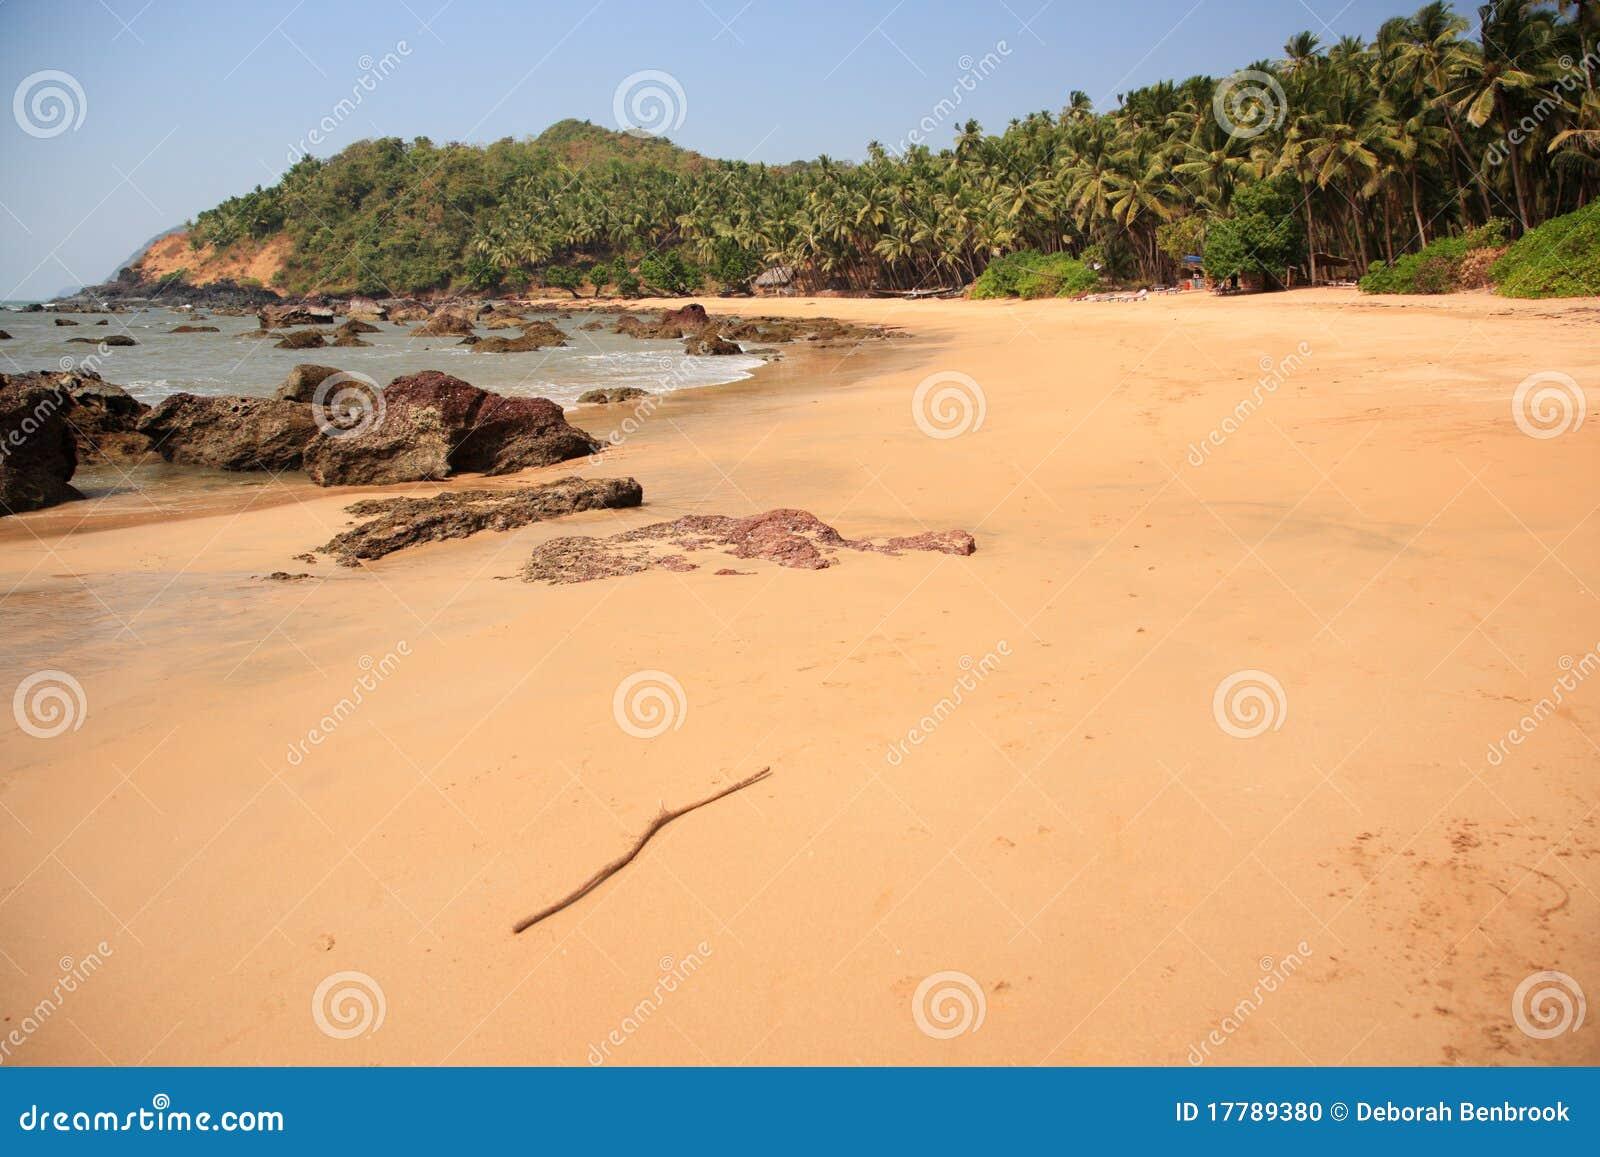 Deserted tropical beach in Goa